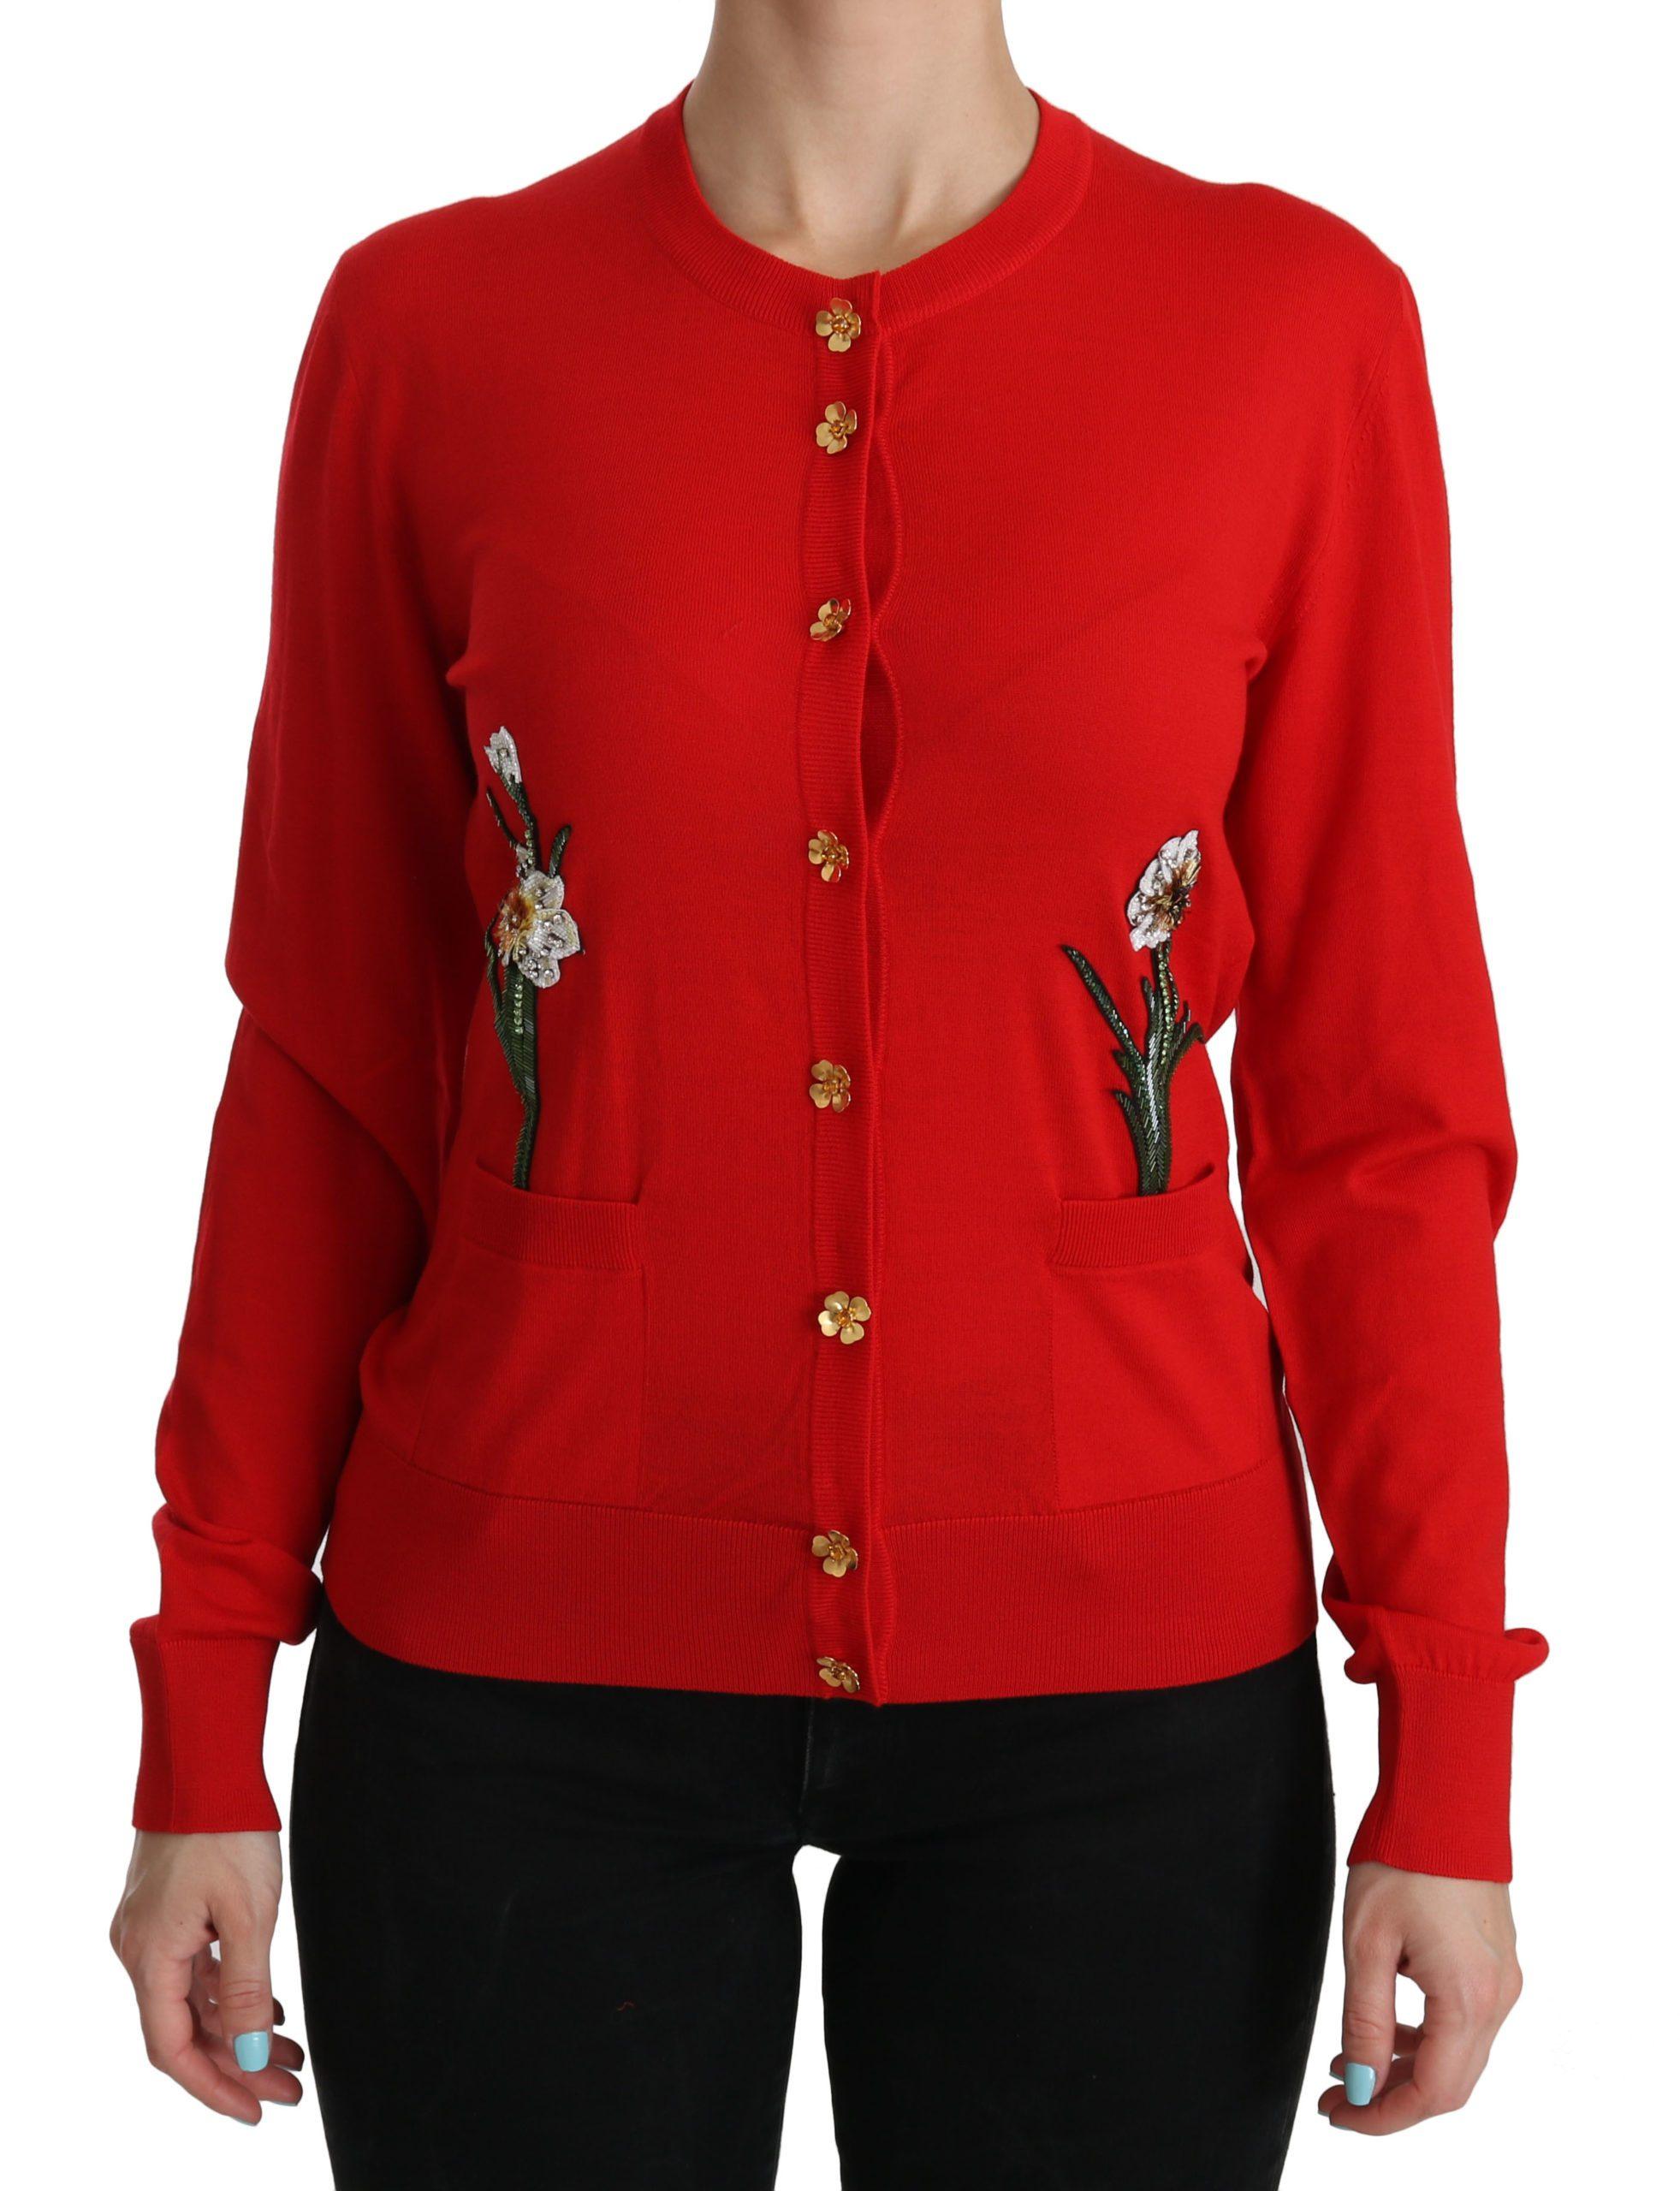 Dolce & Gabbana Women's Wool Crystal Floral Cardigan Red TSH3854 - IT40|S